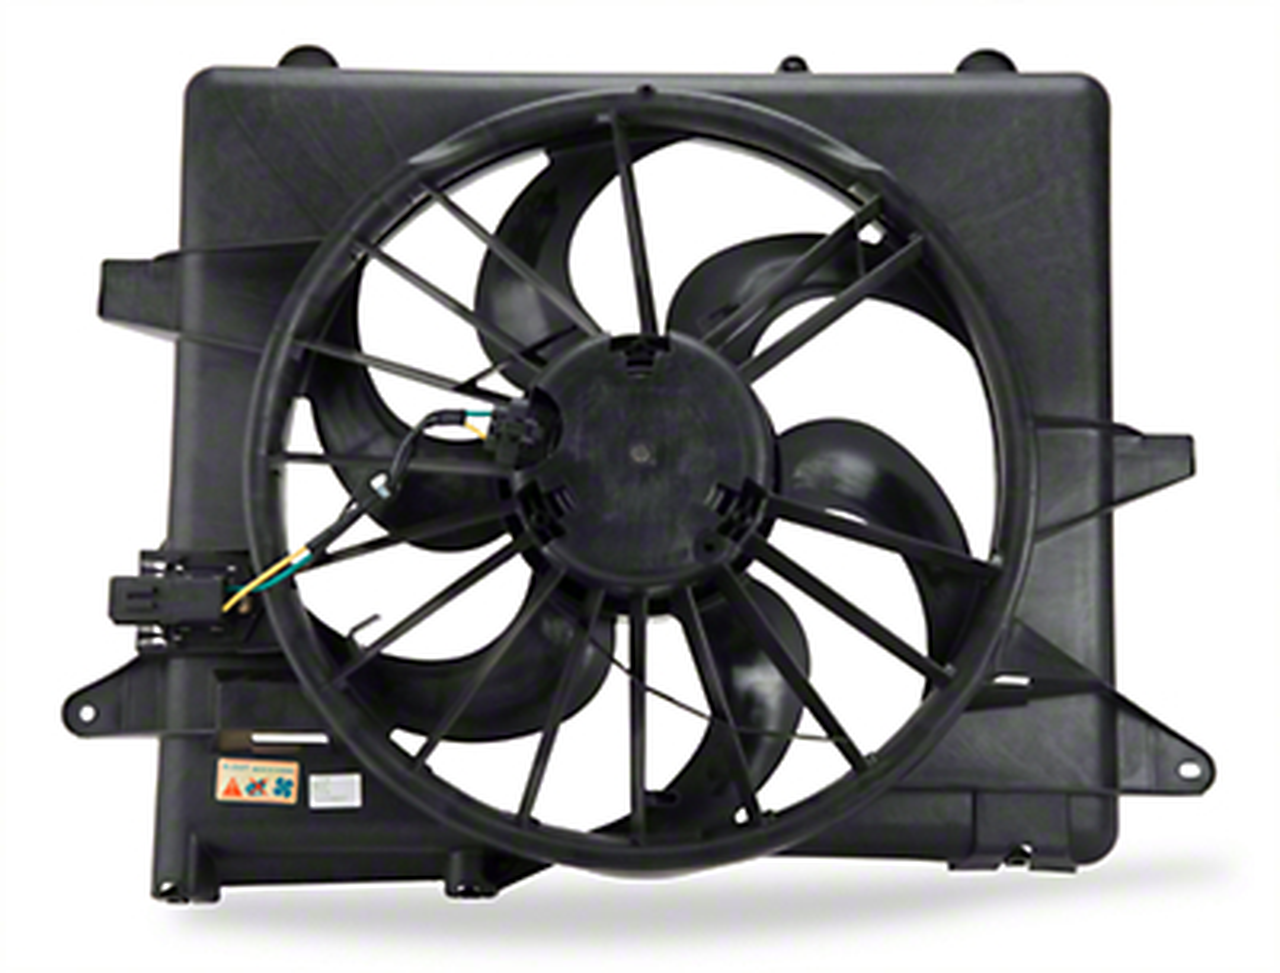 OPR Radiator Fan and Shroud Assembly (05-09 GT, V6)